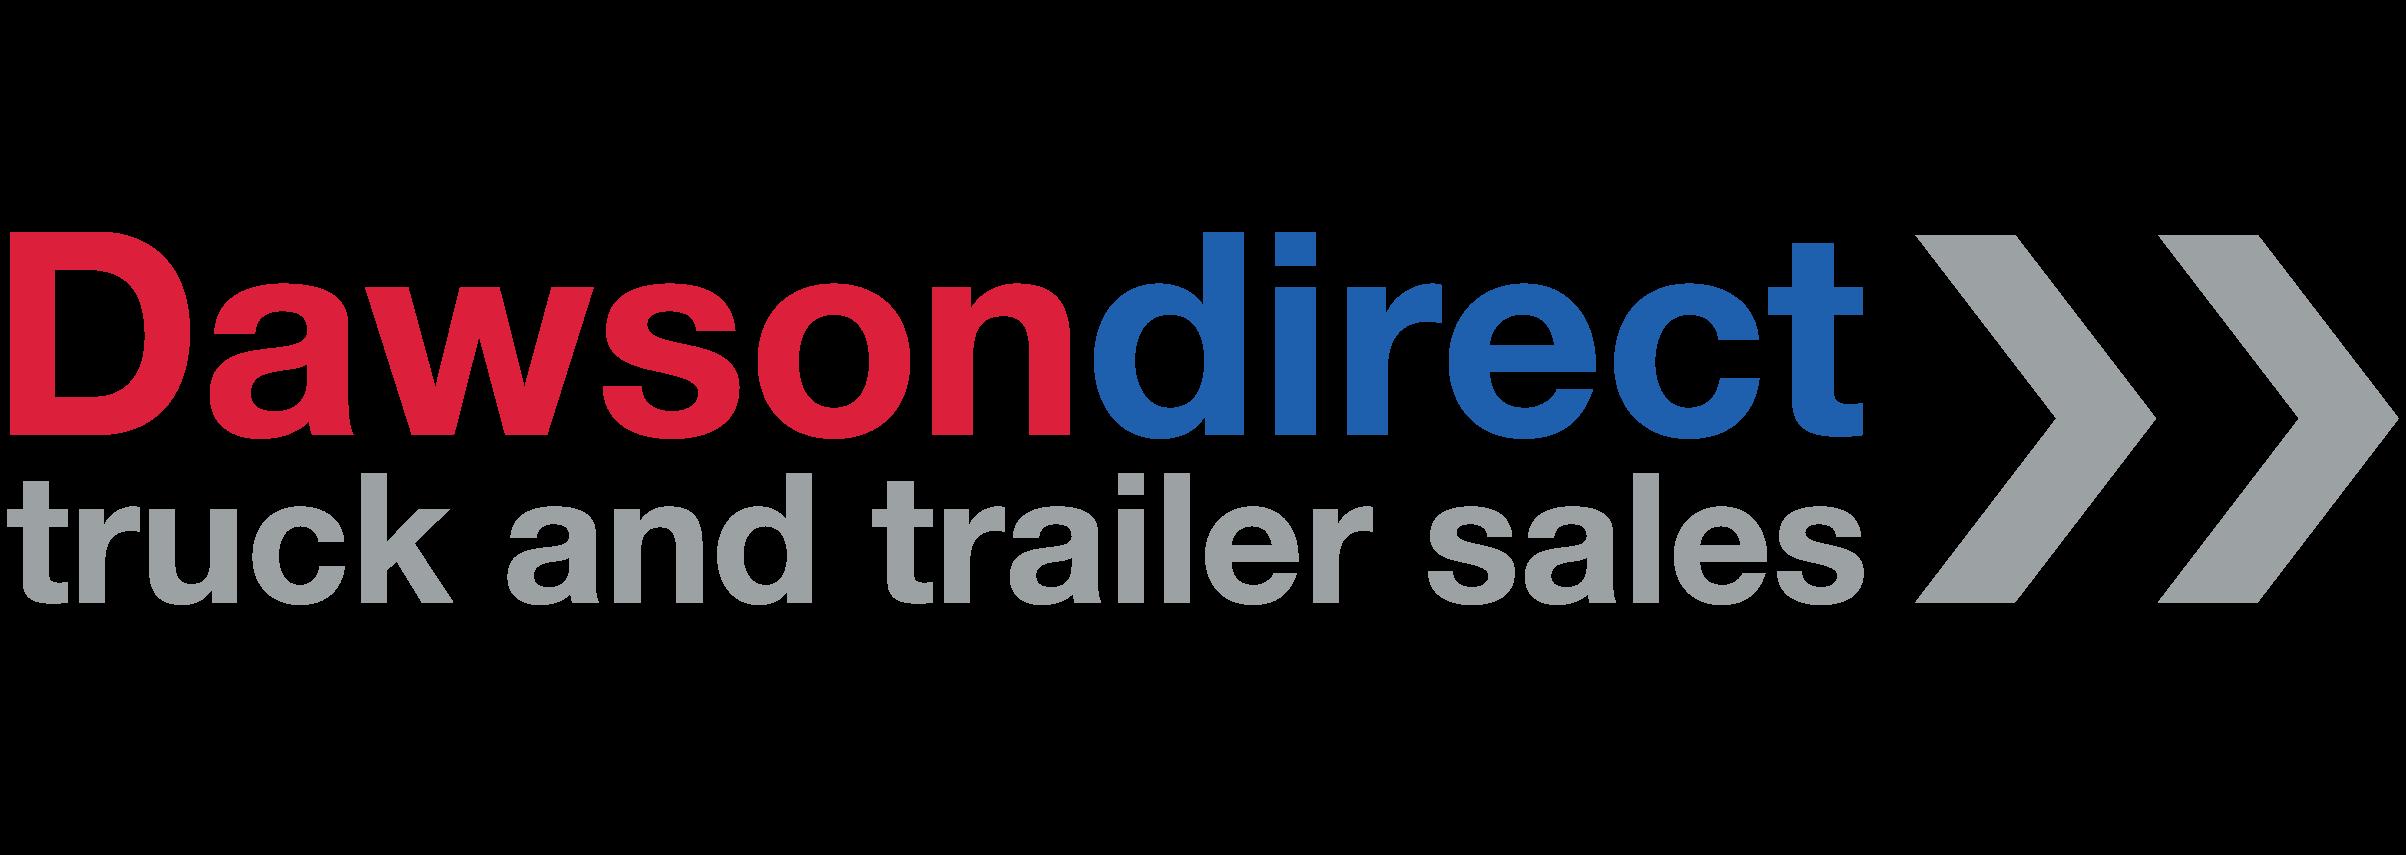 Dawsondirect Logo